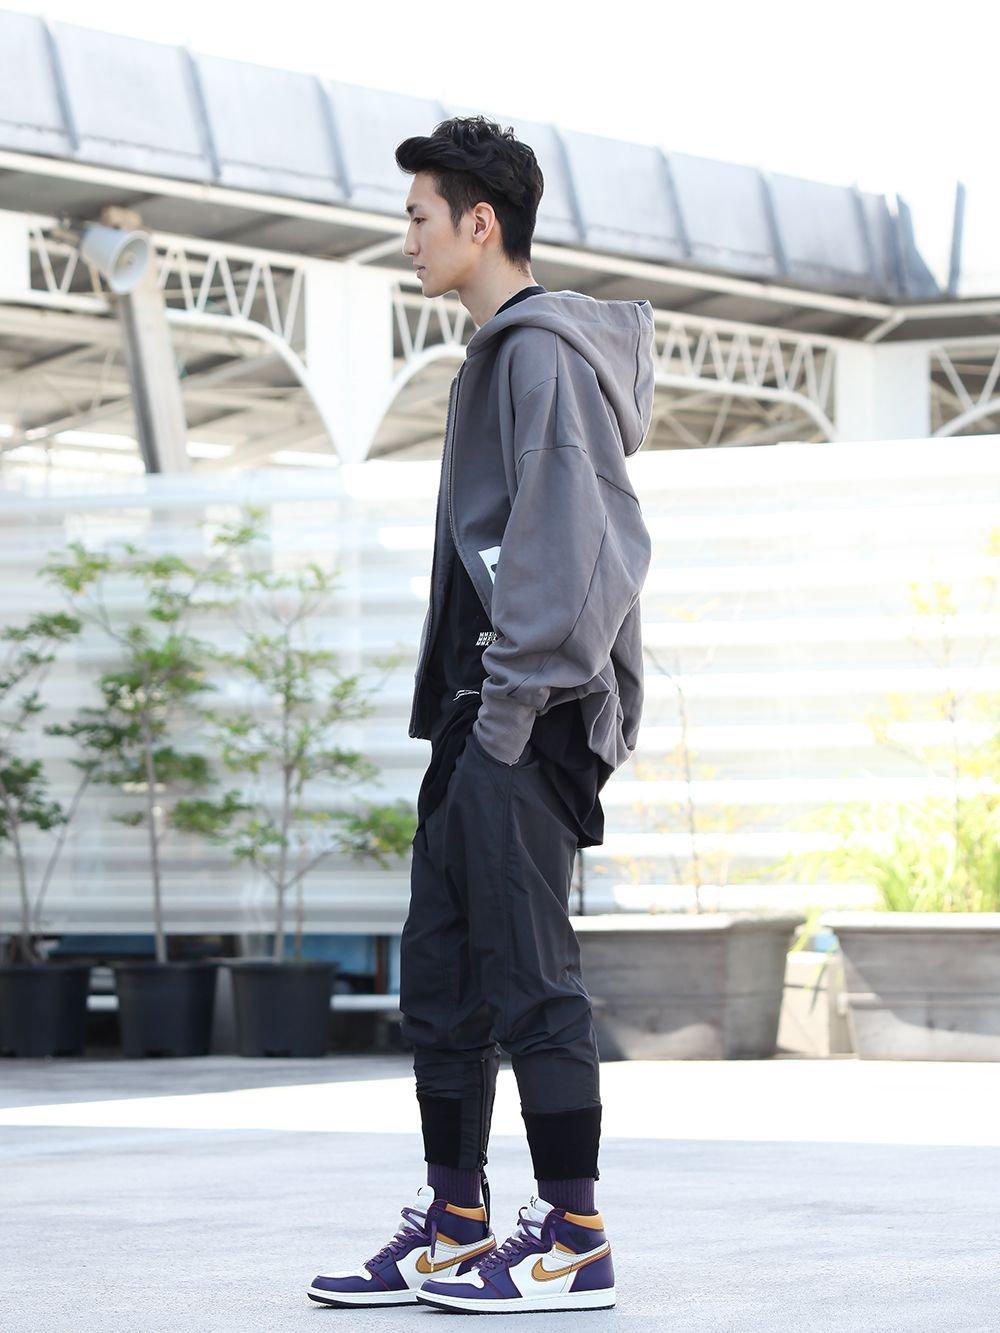 .LOGY kyoto 19-20AW JULIUS  【D.A. BALLOON HOODIE】STREET STYLE!! - 1-003